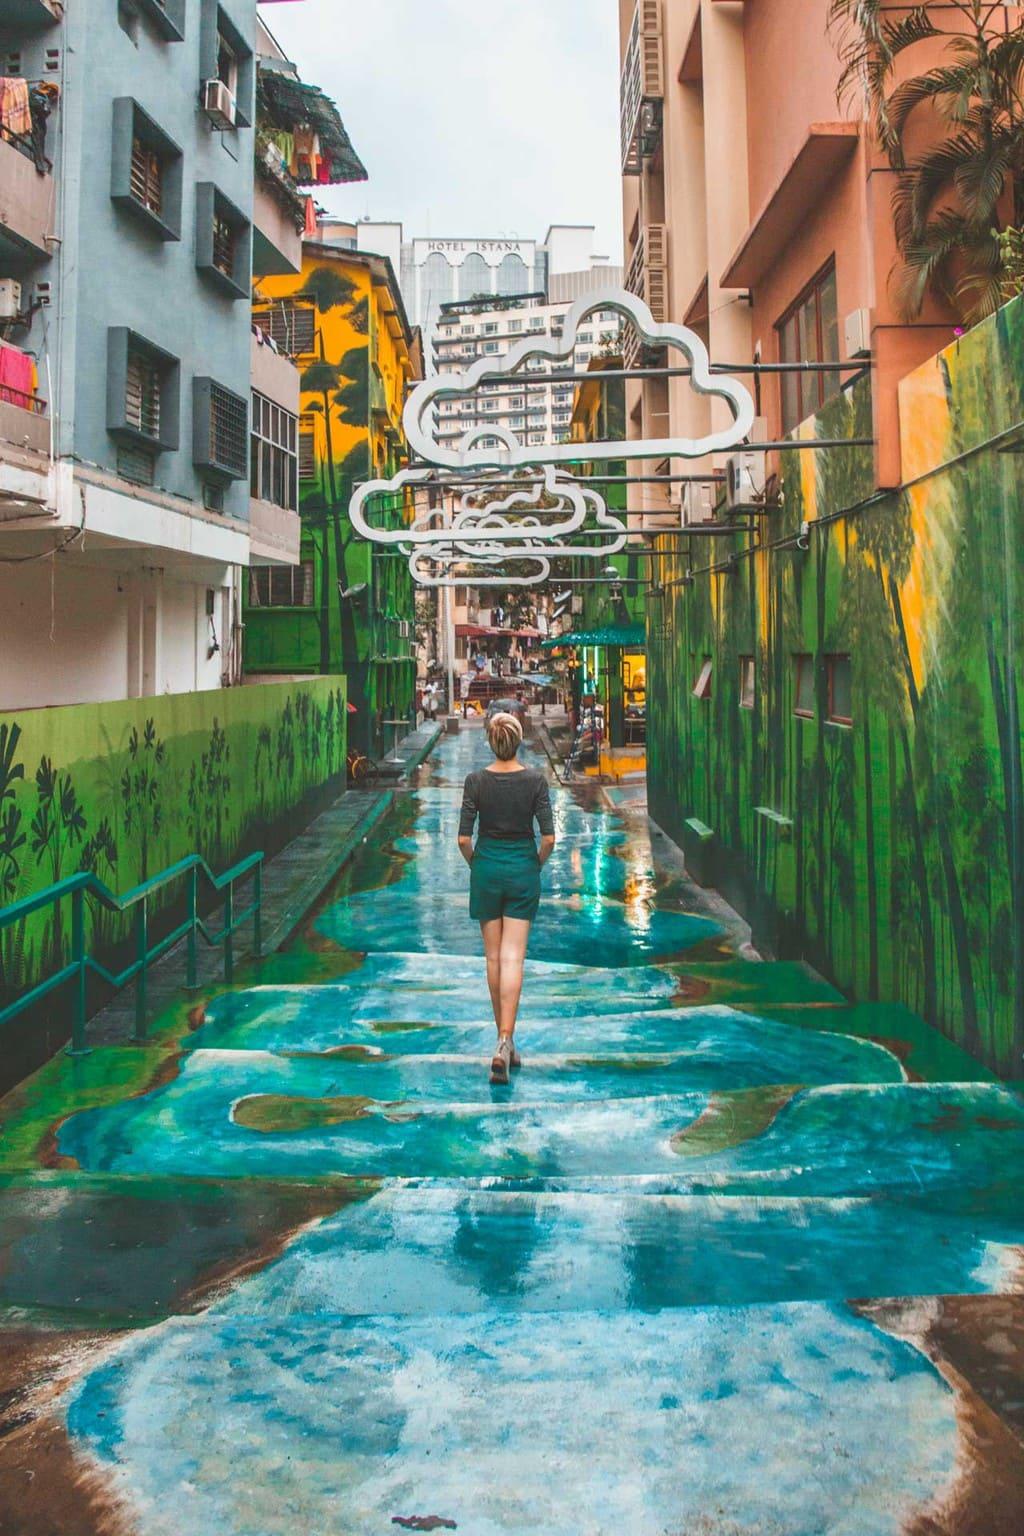 Bukit Bintang Street Art Waterfall Clouds, Kuala Lumpur